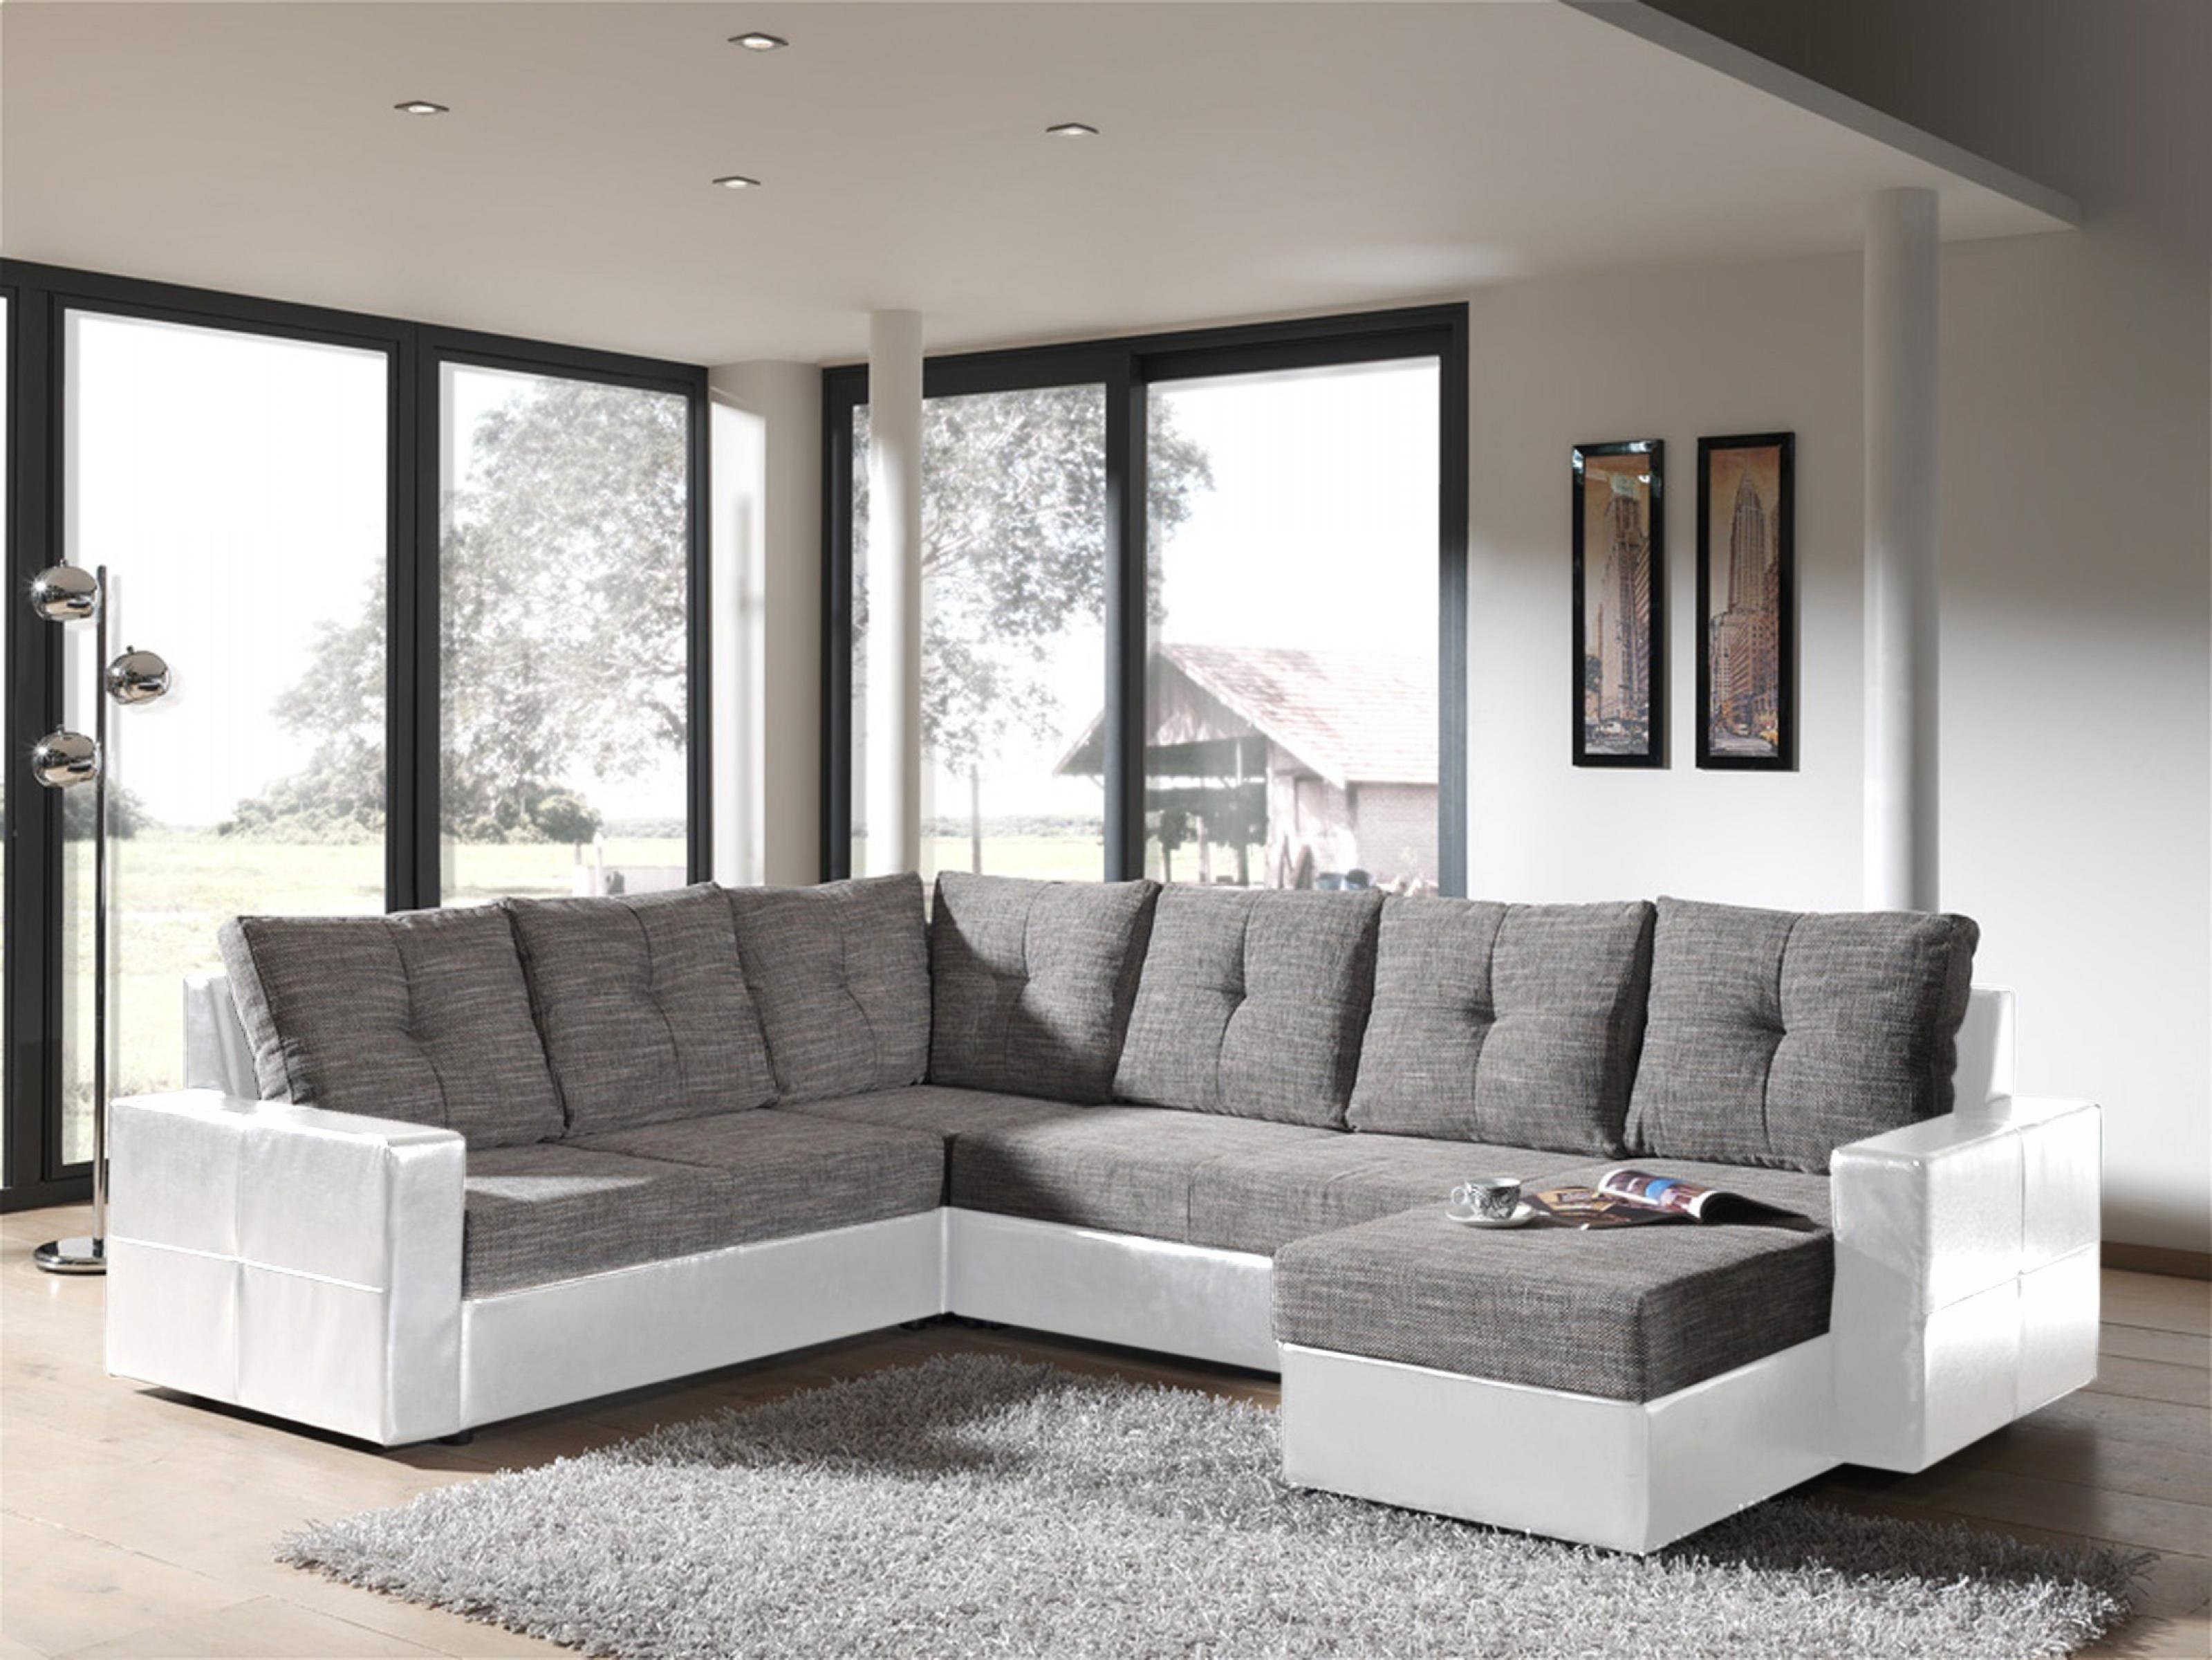 Canapé Cuir Convertible Ikea Frais Image Ikea Salon En Cuir